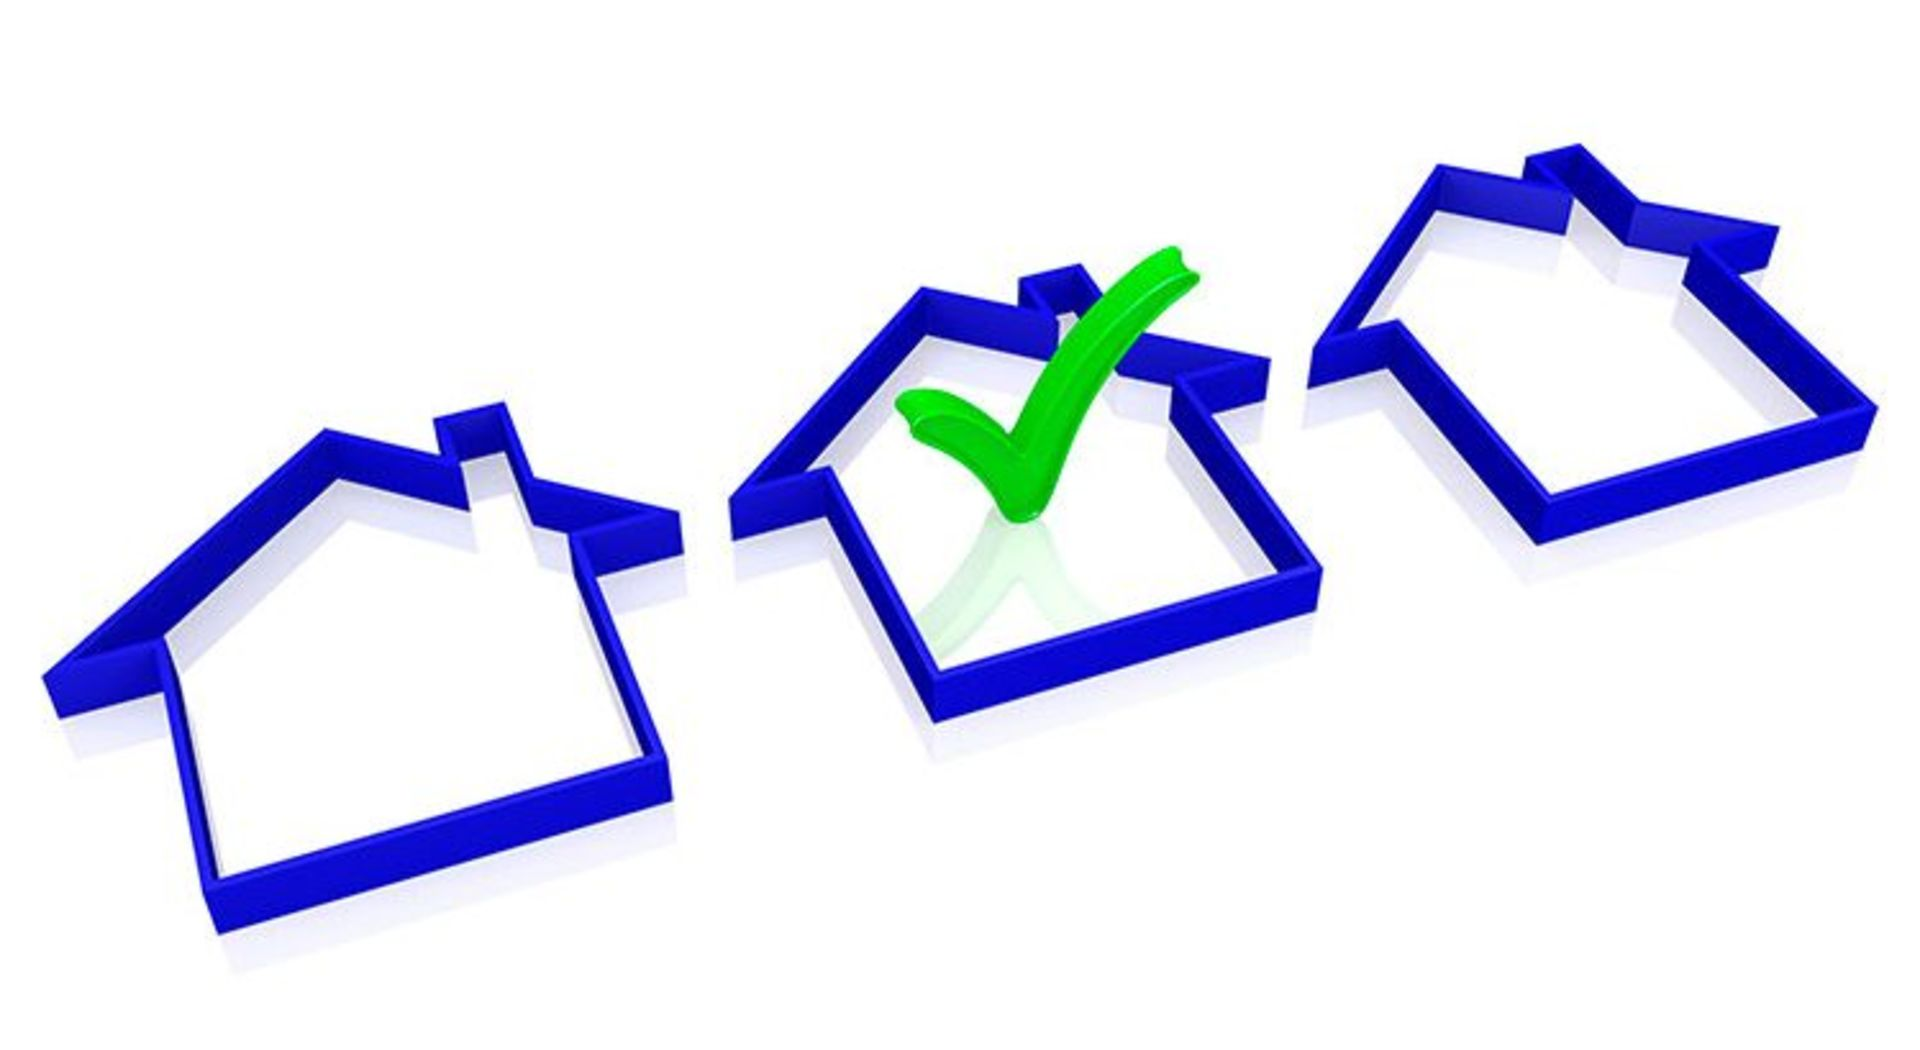 US Housing Market Swings in Favor of Homeownership